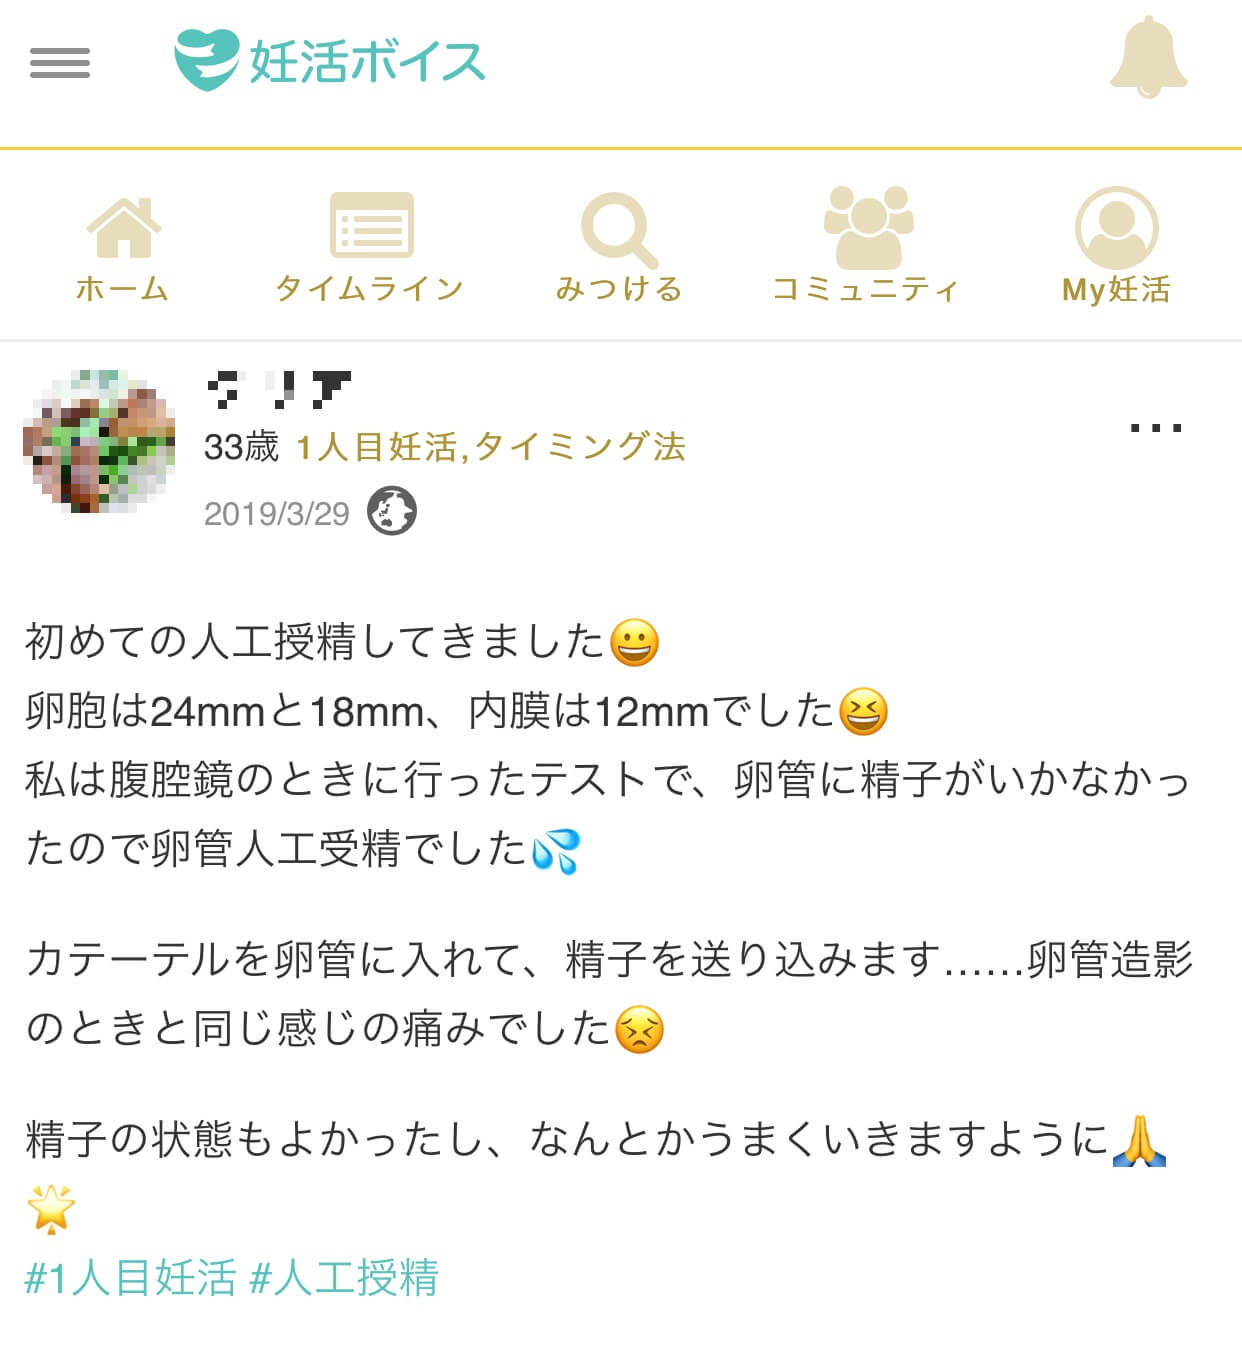 Dさん(33歳・1人目妊活・タイミング法・人工授精)